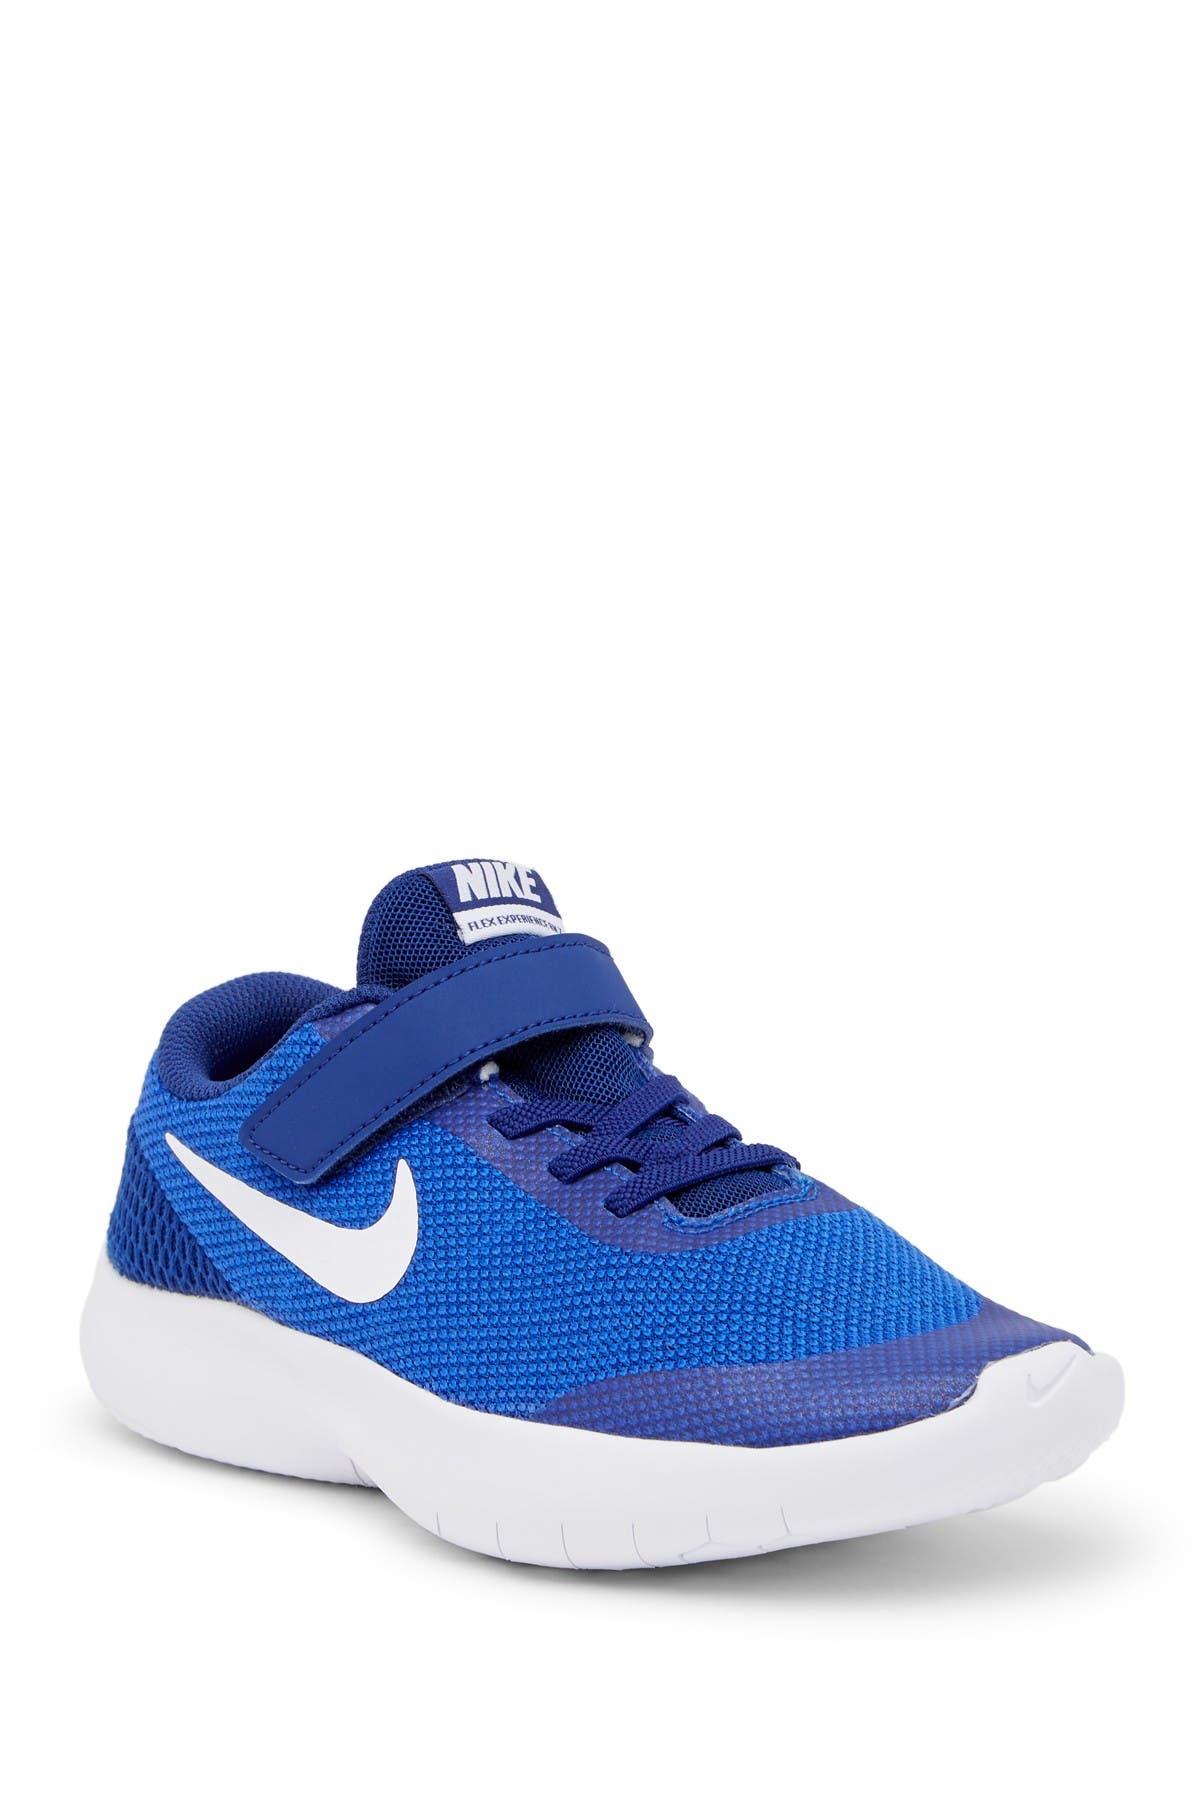 Nike Flex Experience RN 7 Sneaker boys big kids HYPRYL//WHITE Blue sz 4.5 new